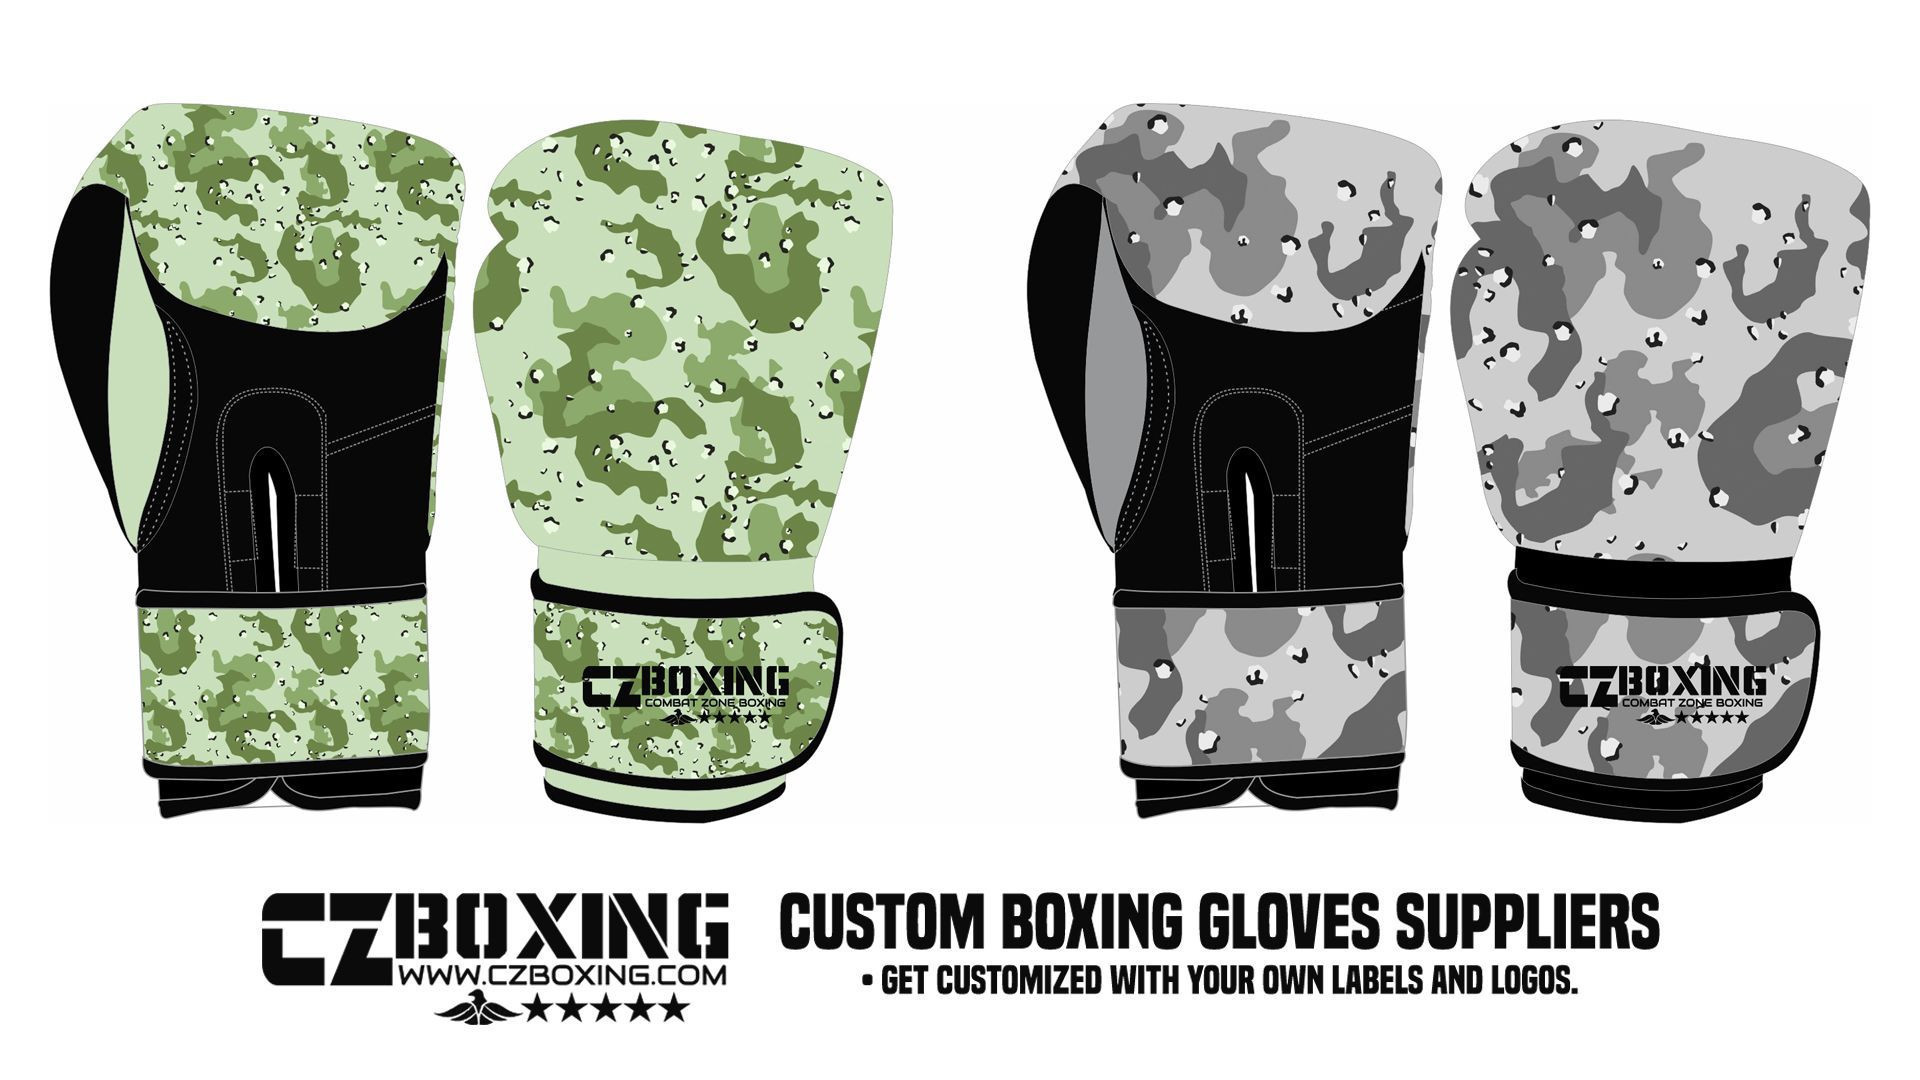 CZ BOXING - Custom Made Boxing Gloves Manufacturer